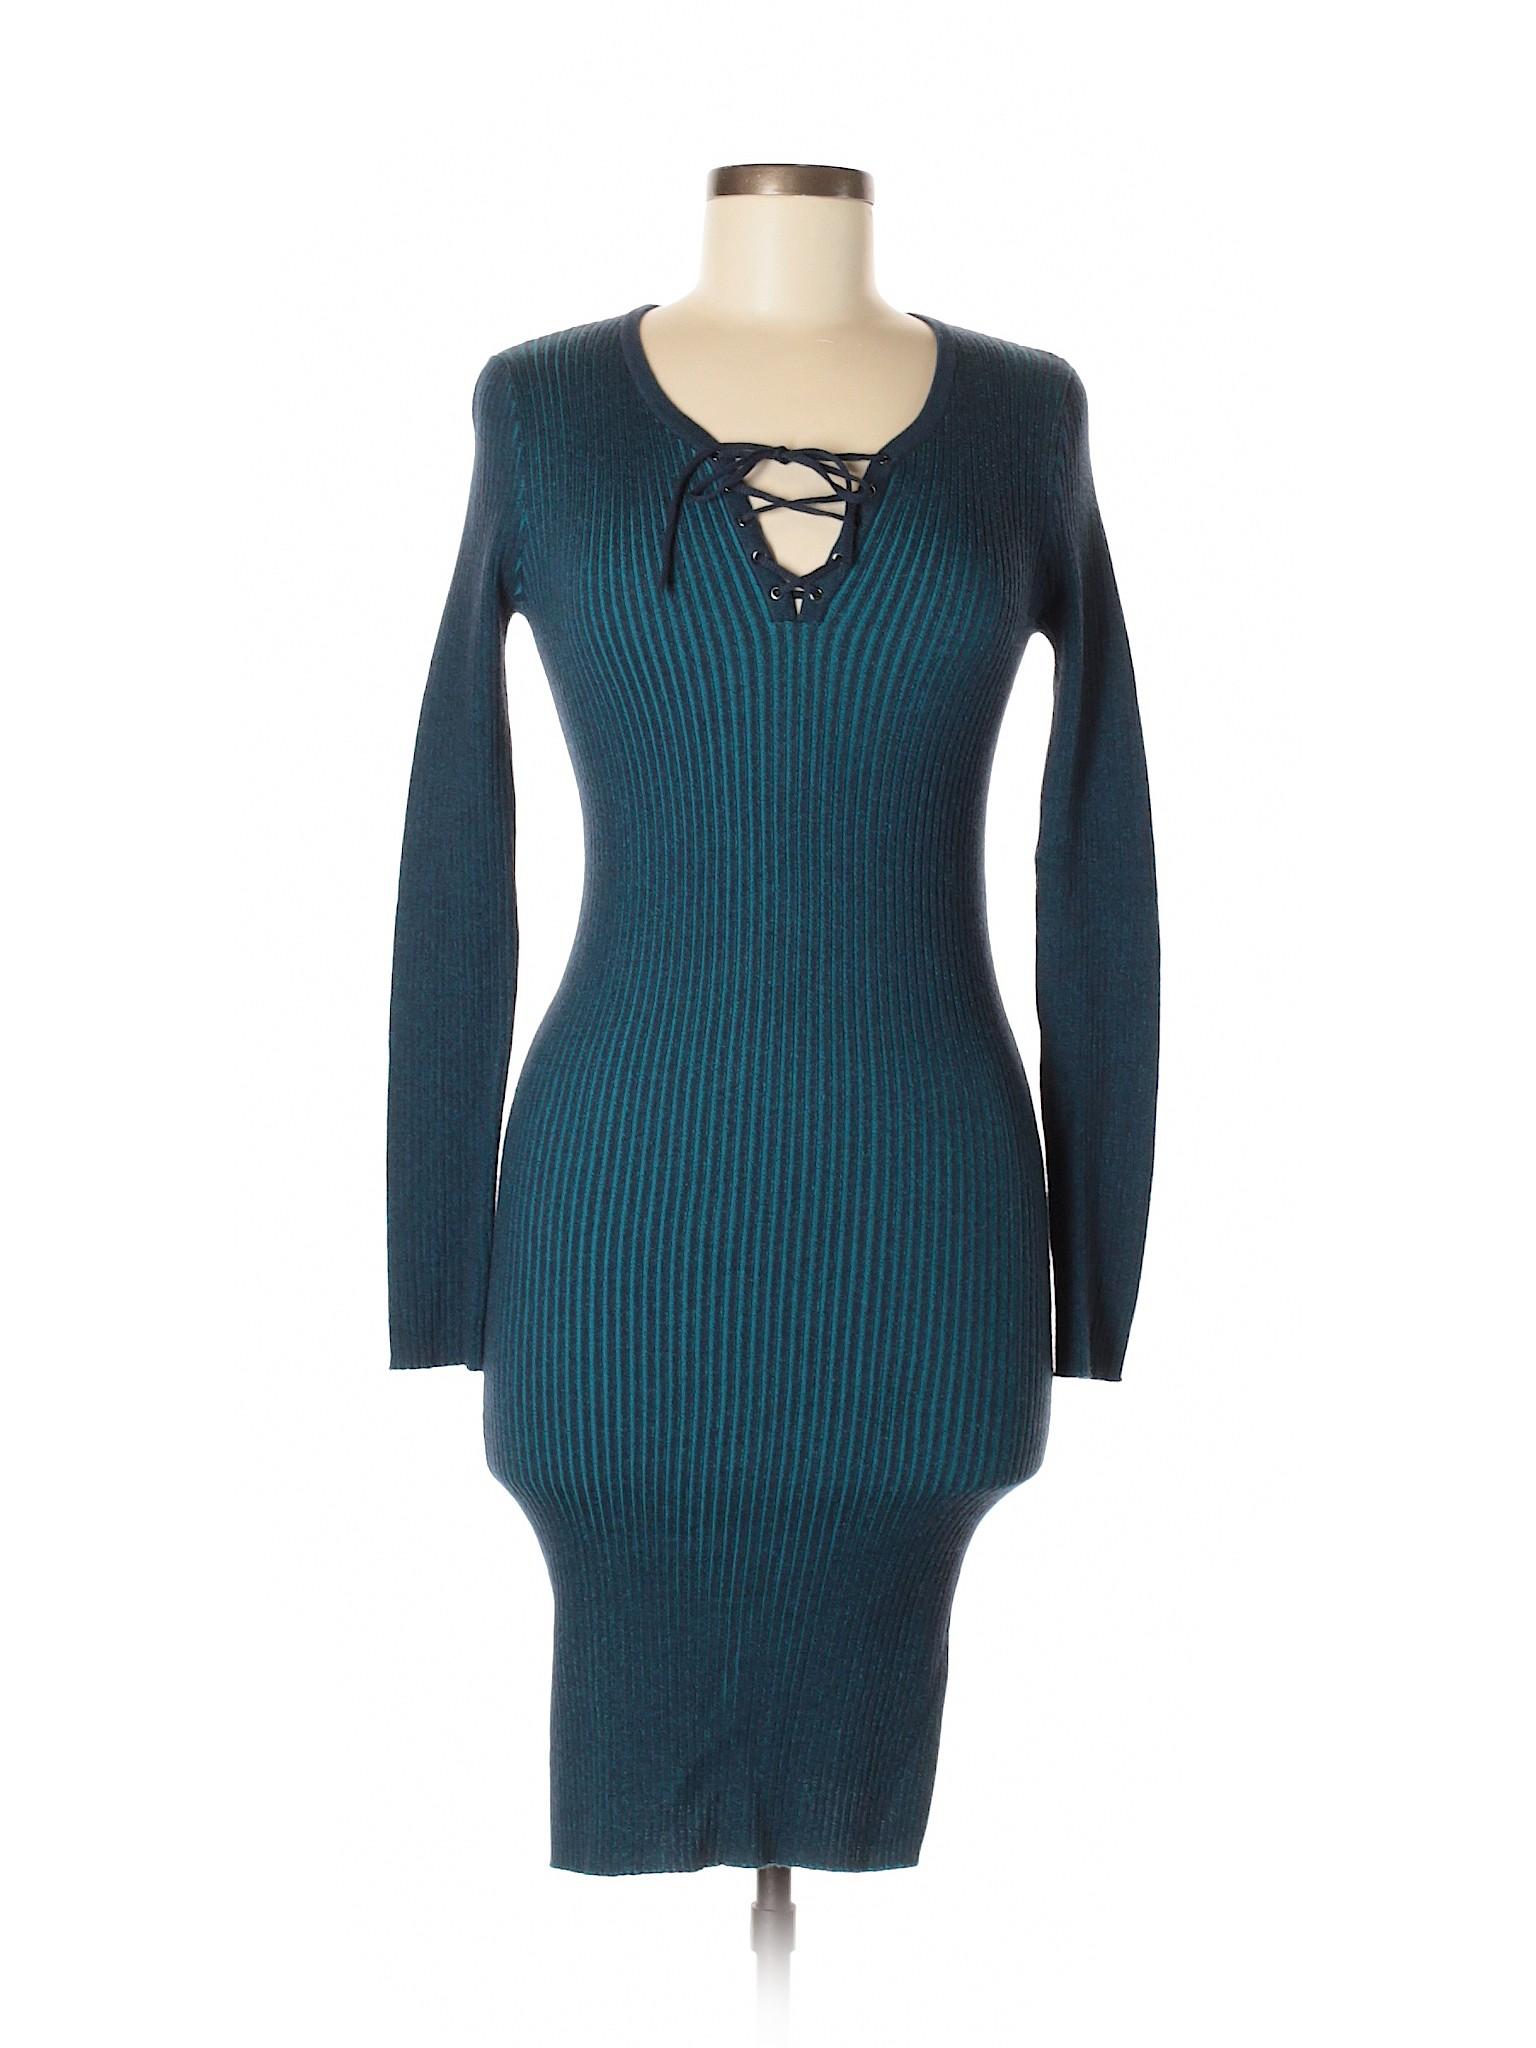 9ed9e9006aea5 Romeo Dress Boutique Couture winter Juliet amp; Casual 5ww478q ...